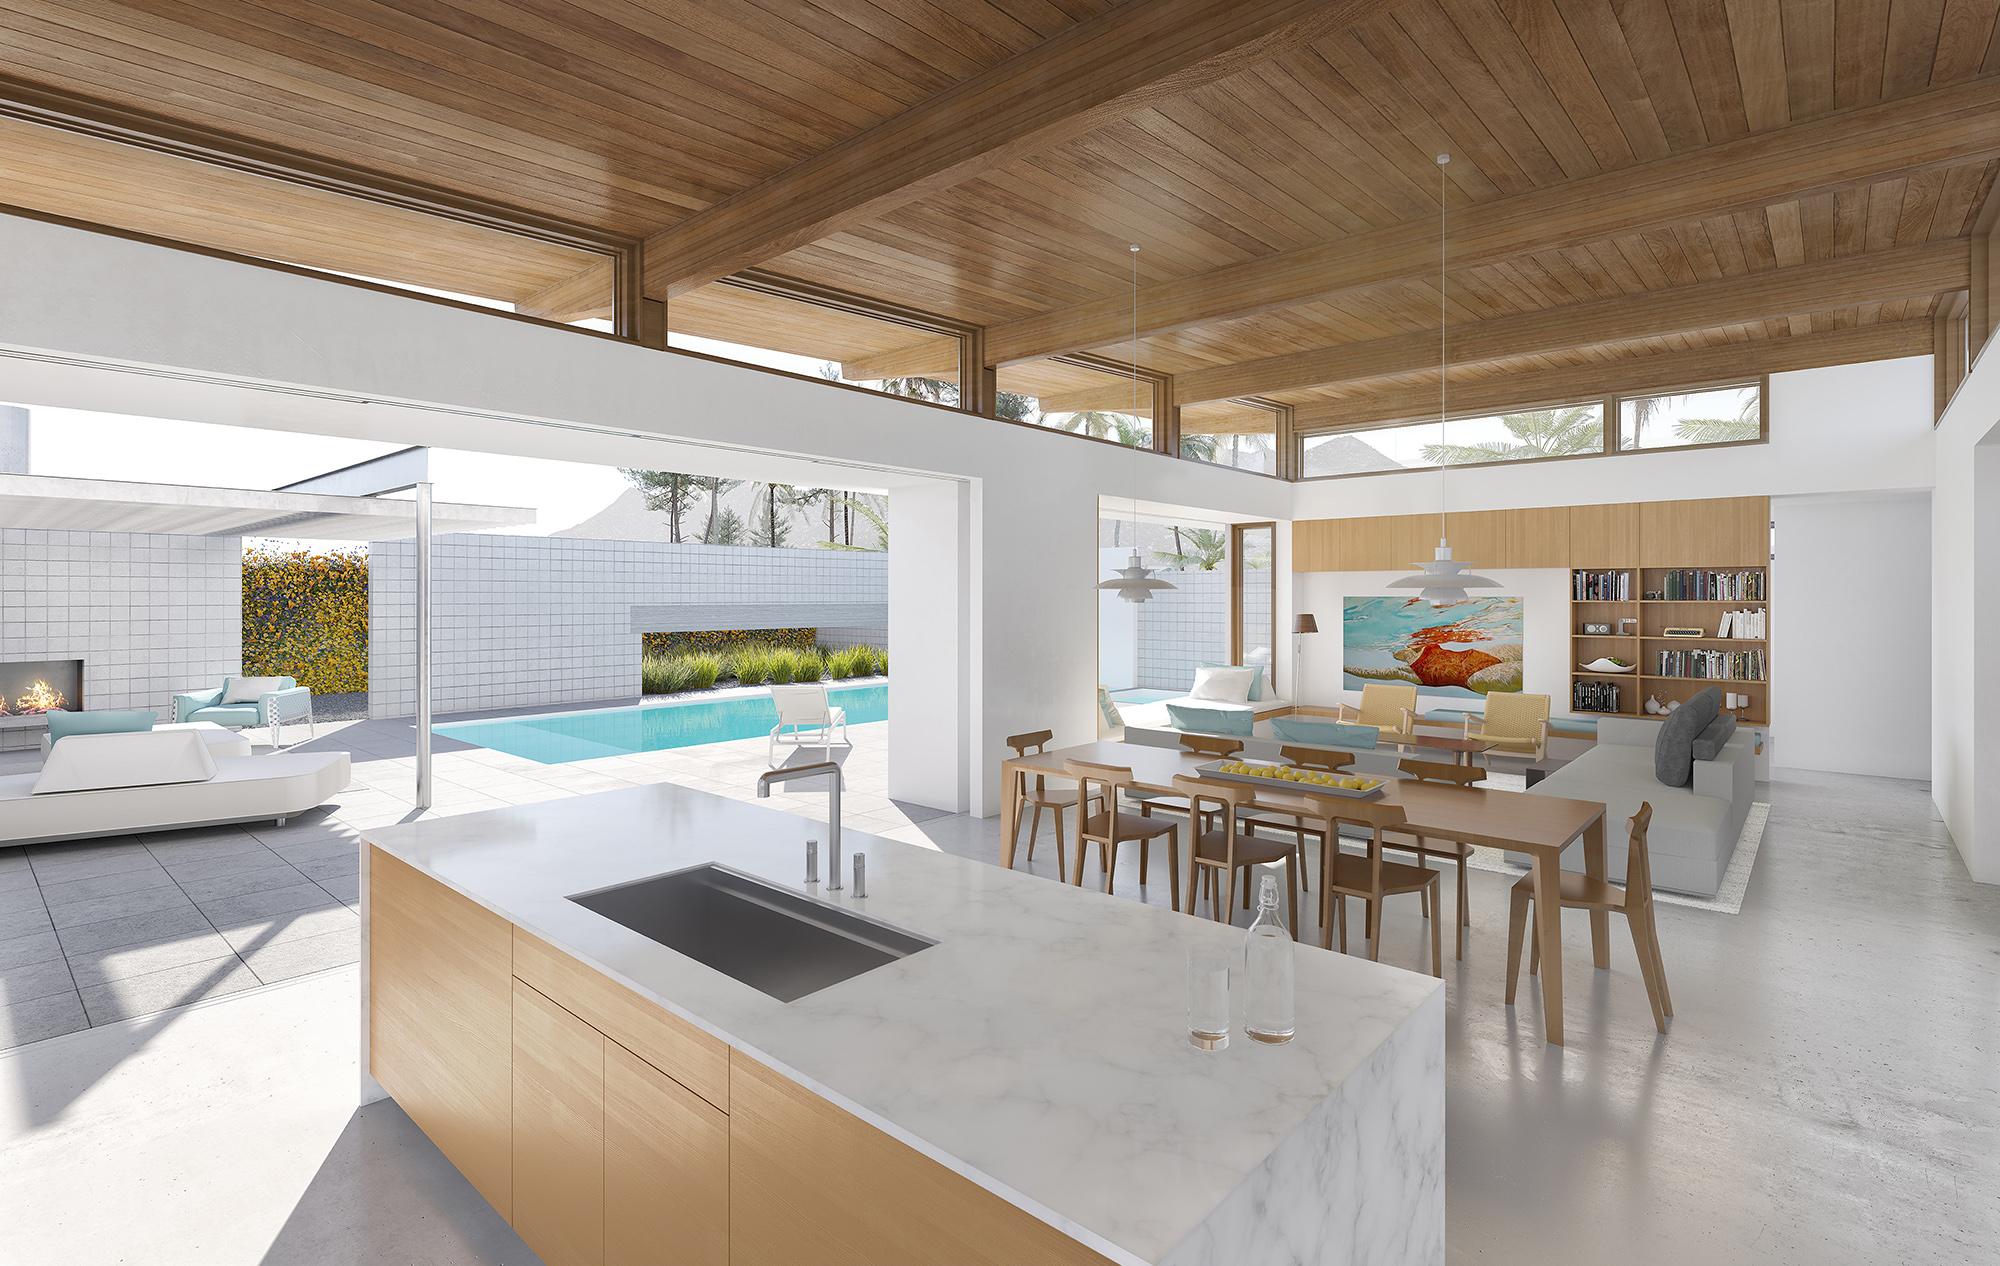 turkel_design_modern_prefab_home_axiomdeserthouse_interior_rendering.jpg